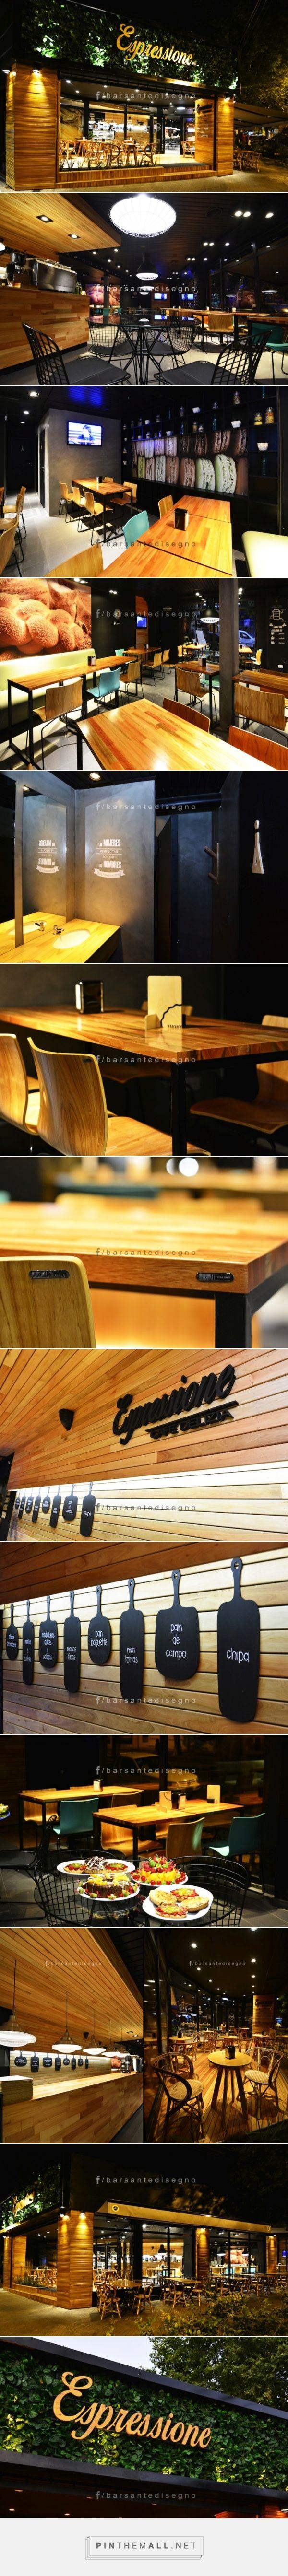 634 best images about cafe - bar - restaurant on pinterest